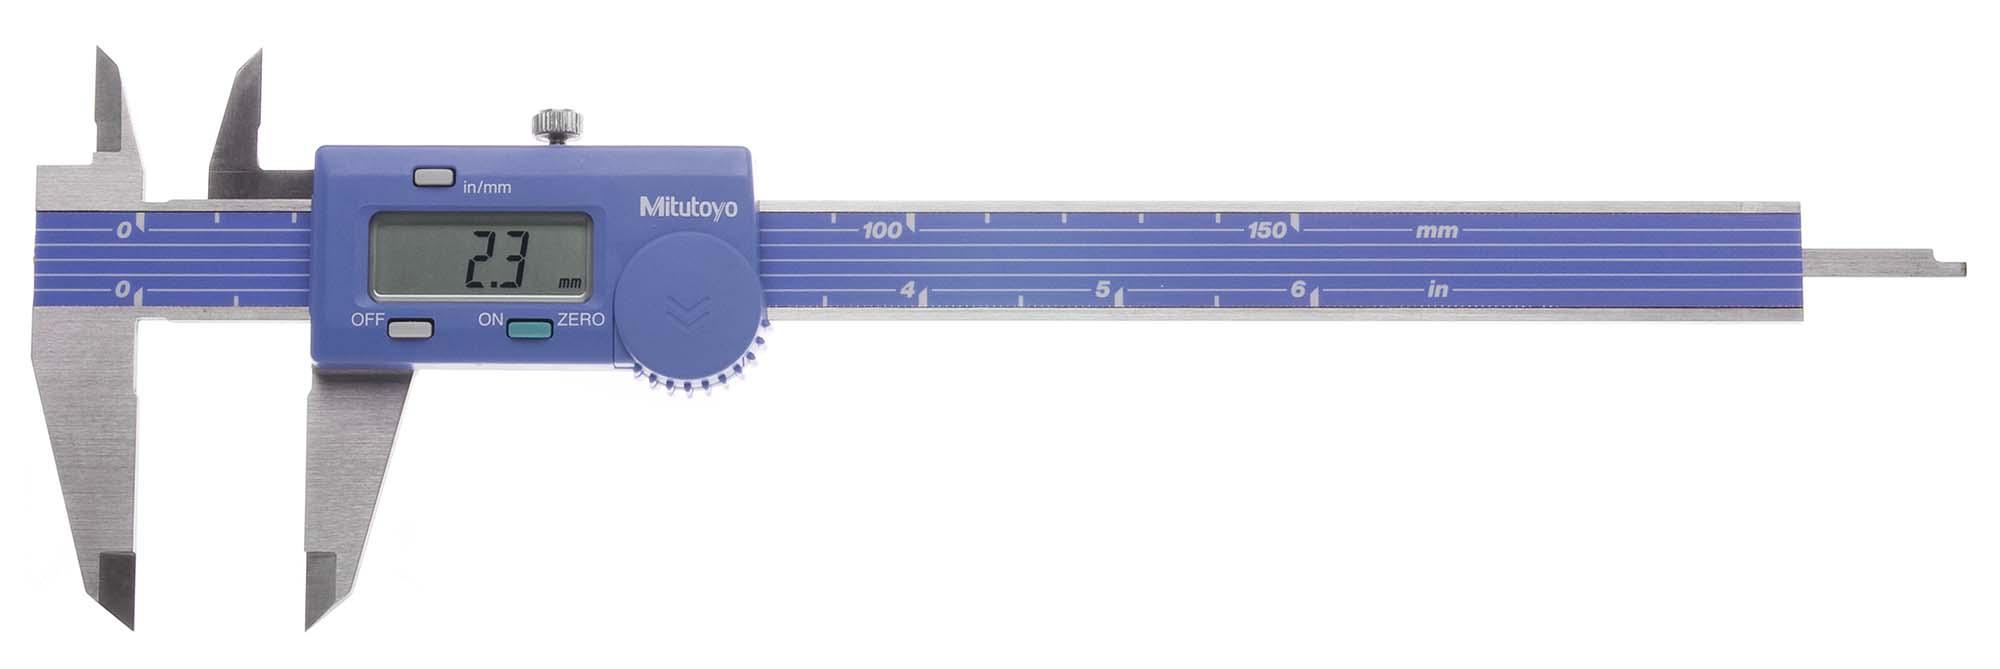 Mitutoyo Mycal Lite Electronic Caliper (sale price)